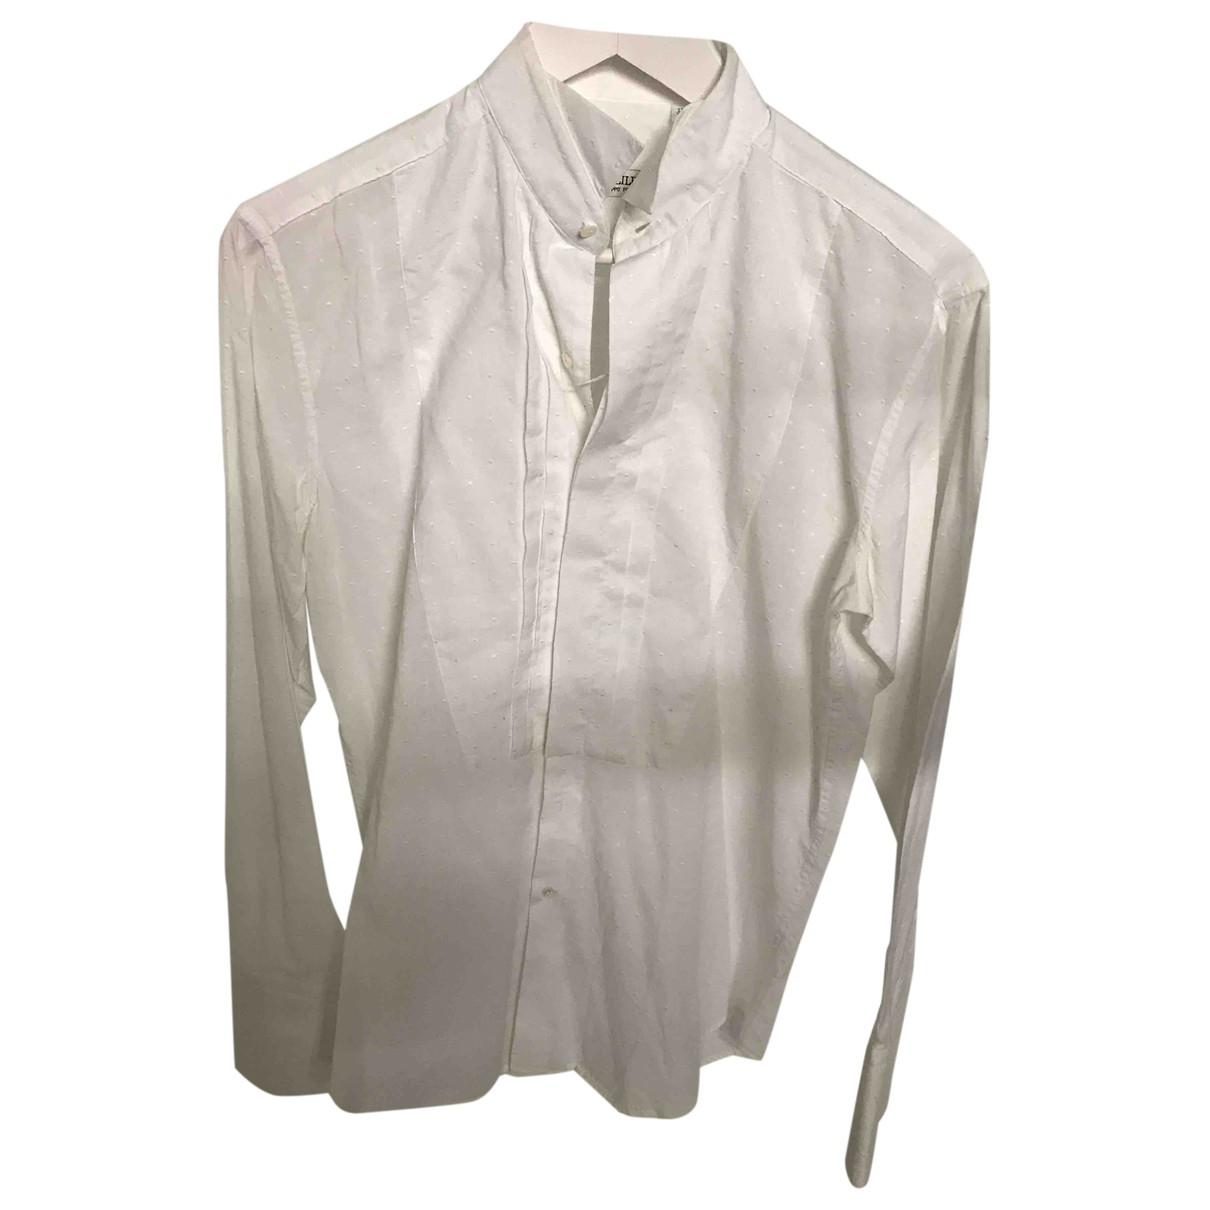 Pal Zileri \N White Cotton Shirts for Men 15 UK - US (tour de cou / collar)